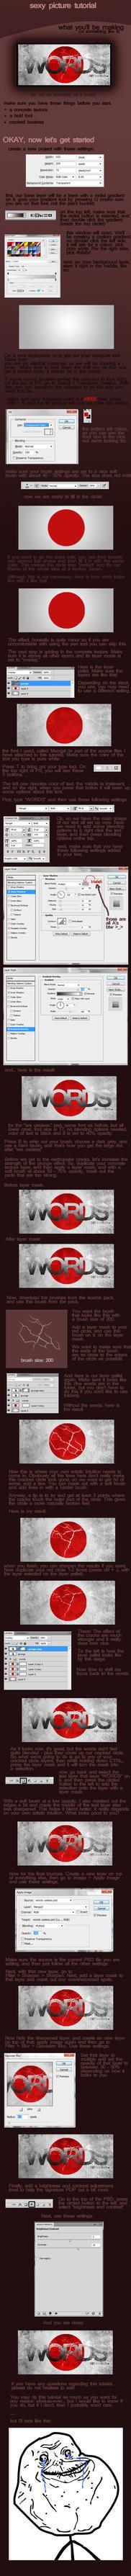 Words Are Useless Tut by Animebuzzer